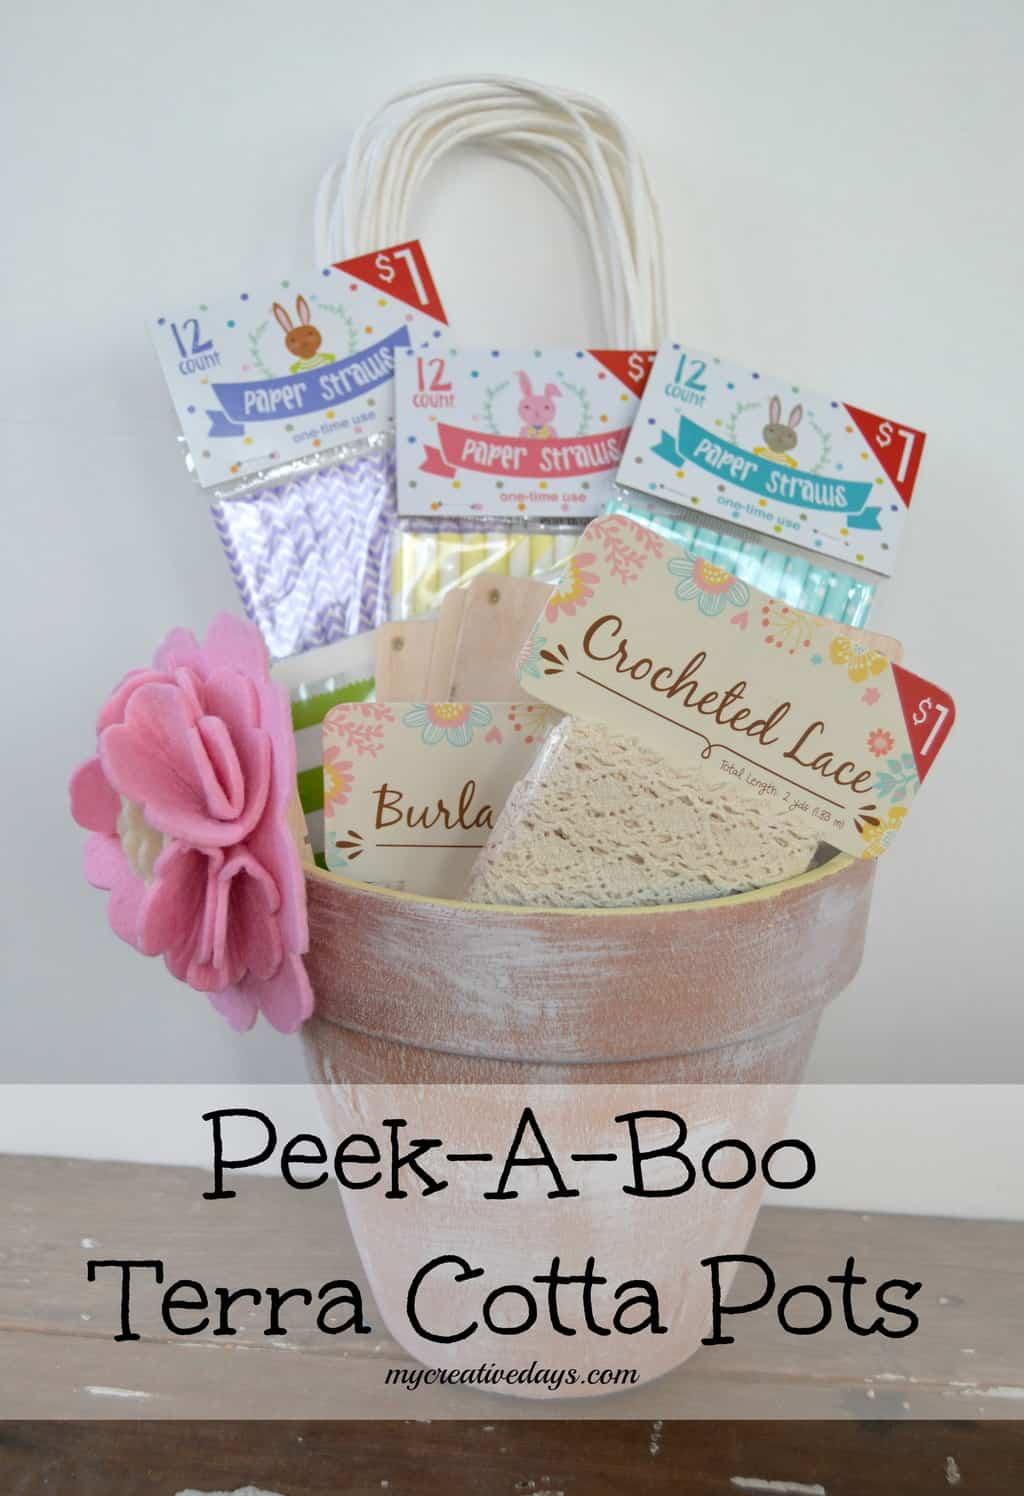 Peek-A-Boo Terra Cotta Pots {Make It Challenge} mycreativedays.com